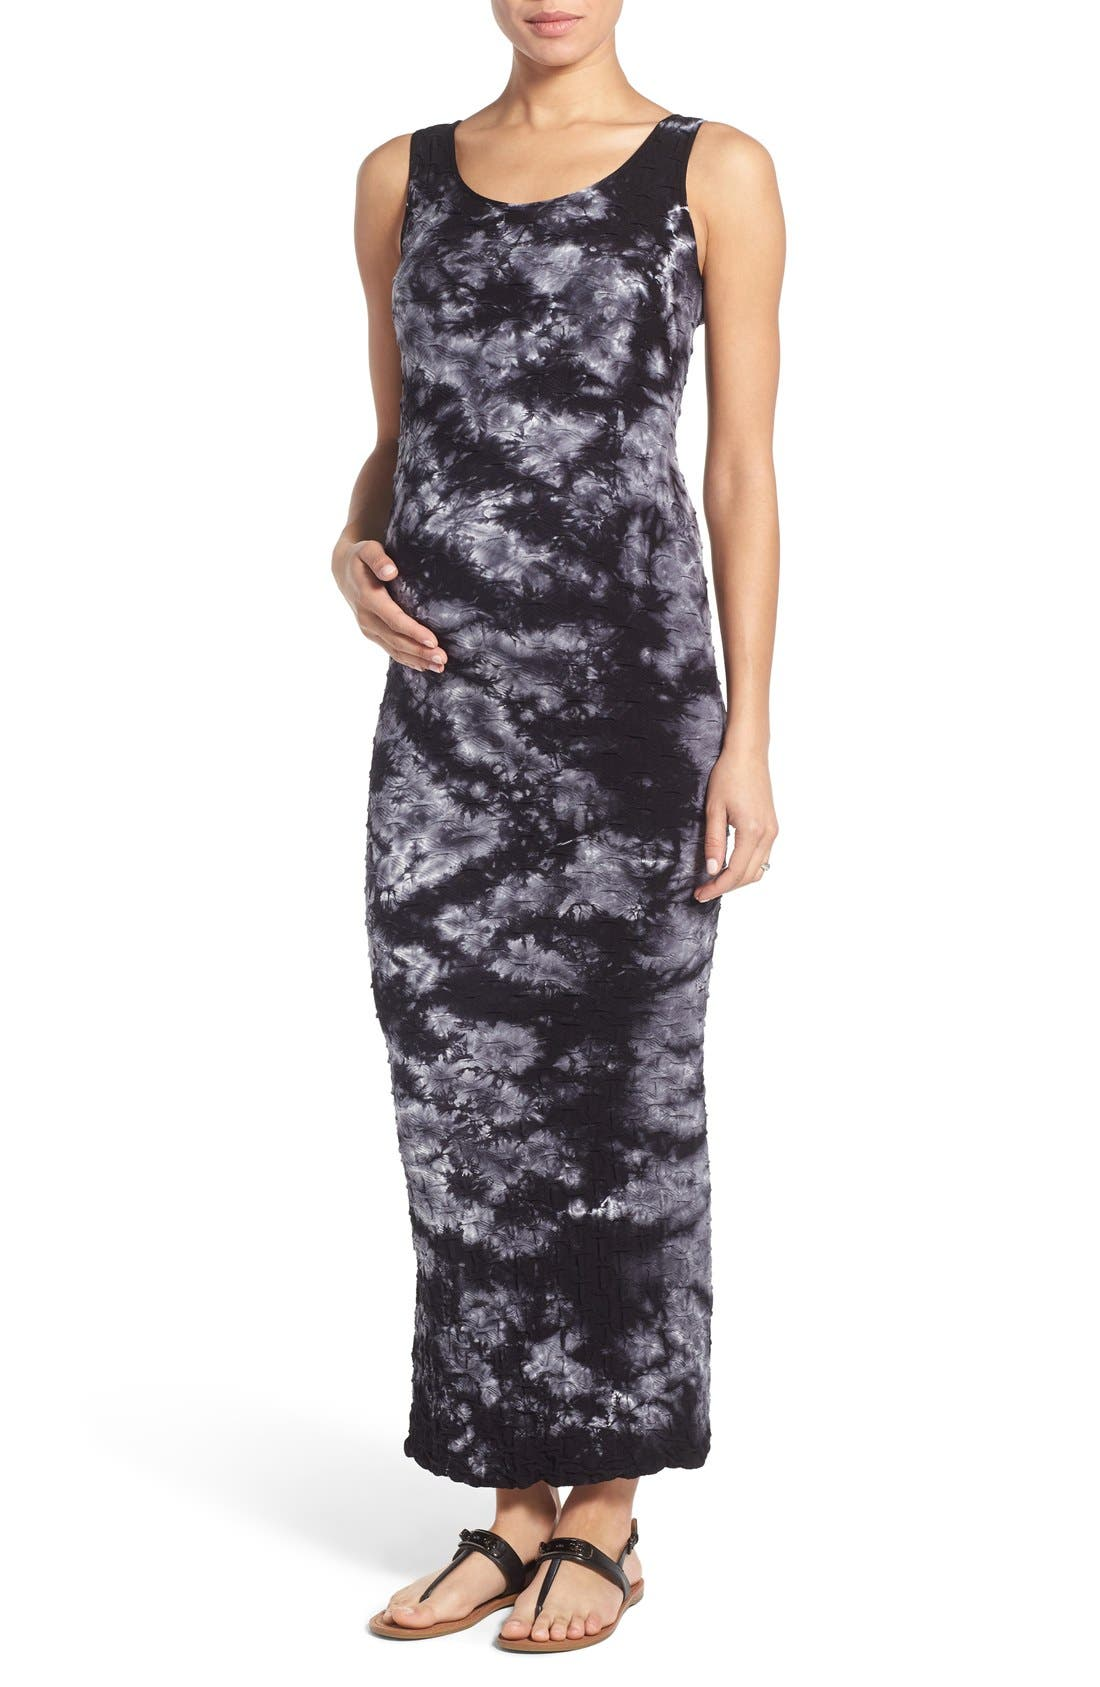 'Lattice' Tie Dye Textured Maternity Maxi Dress,                         Main,                         color, BLACK